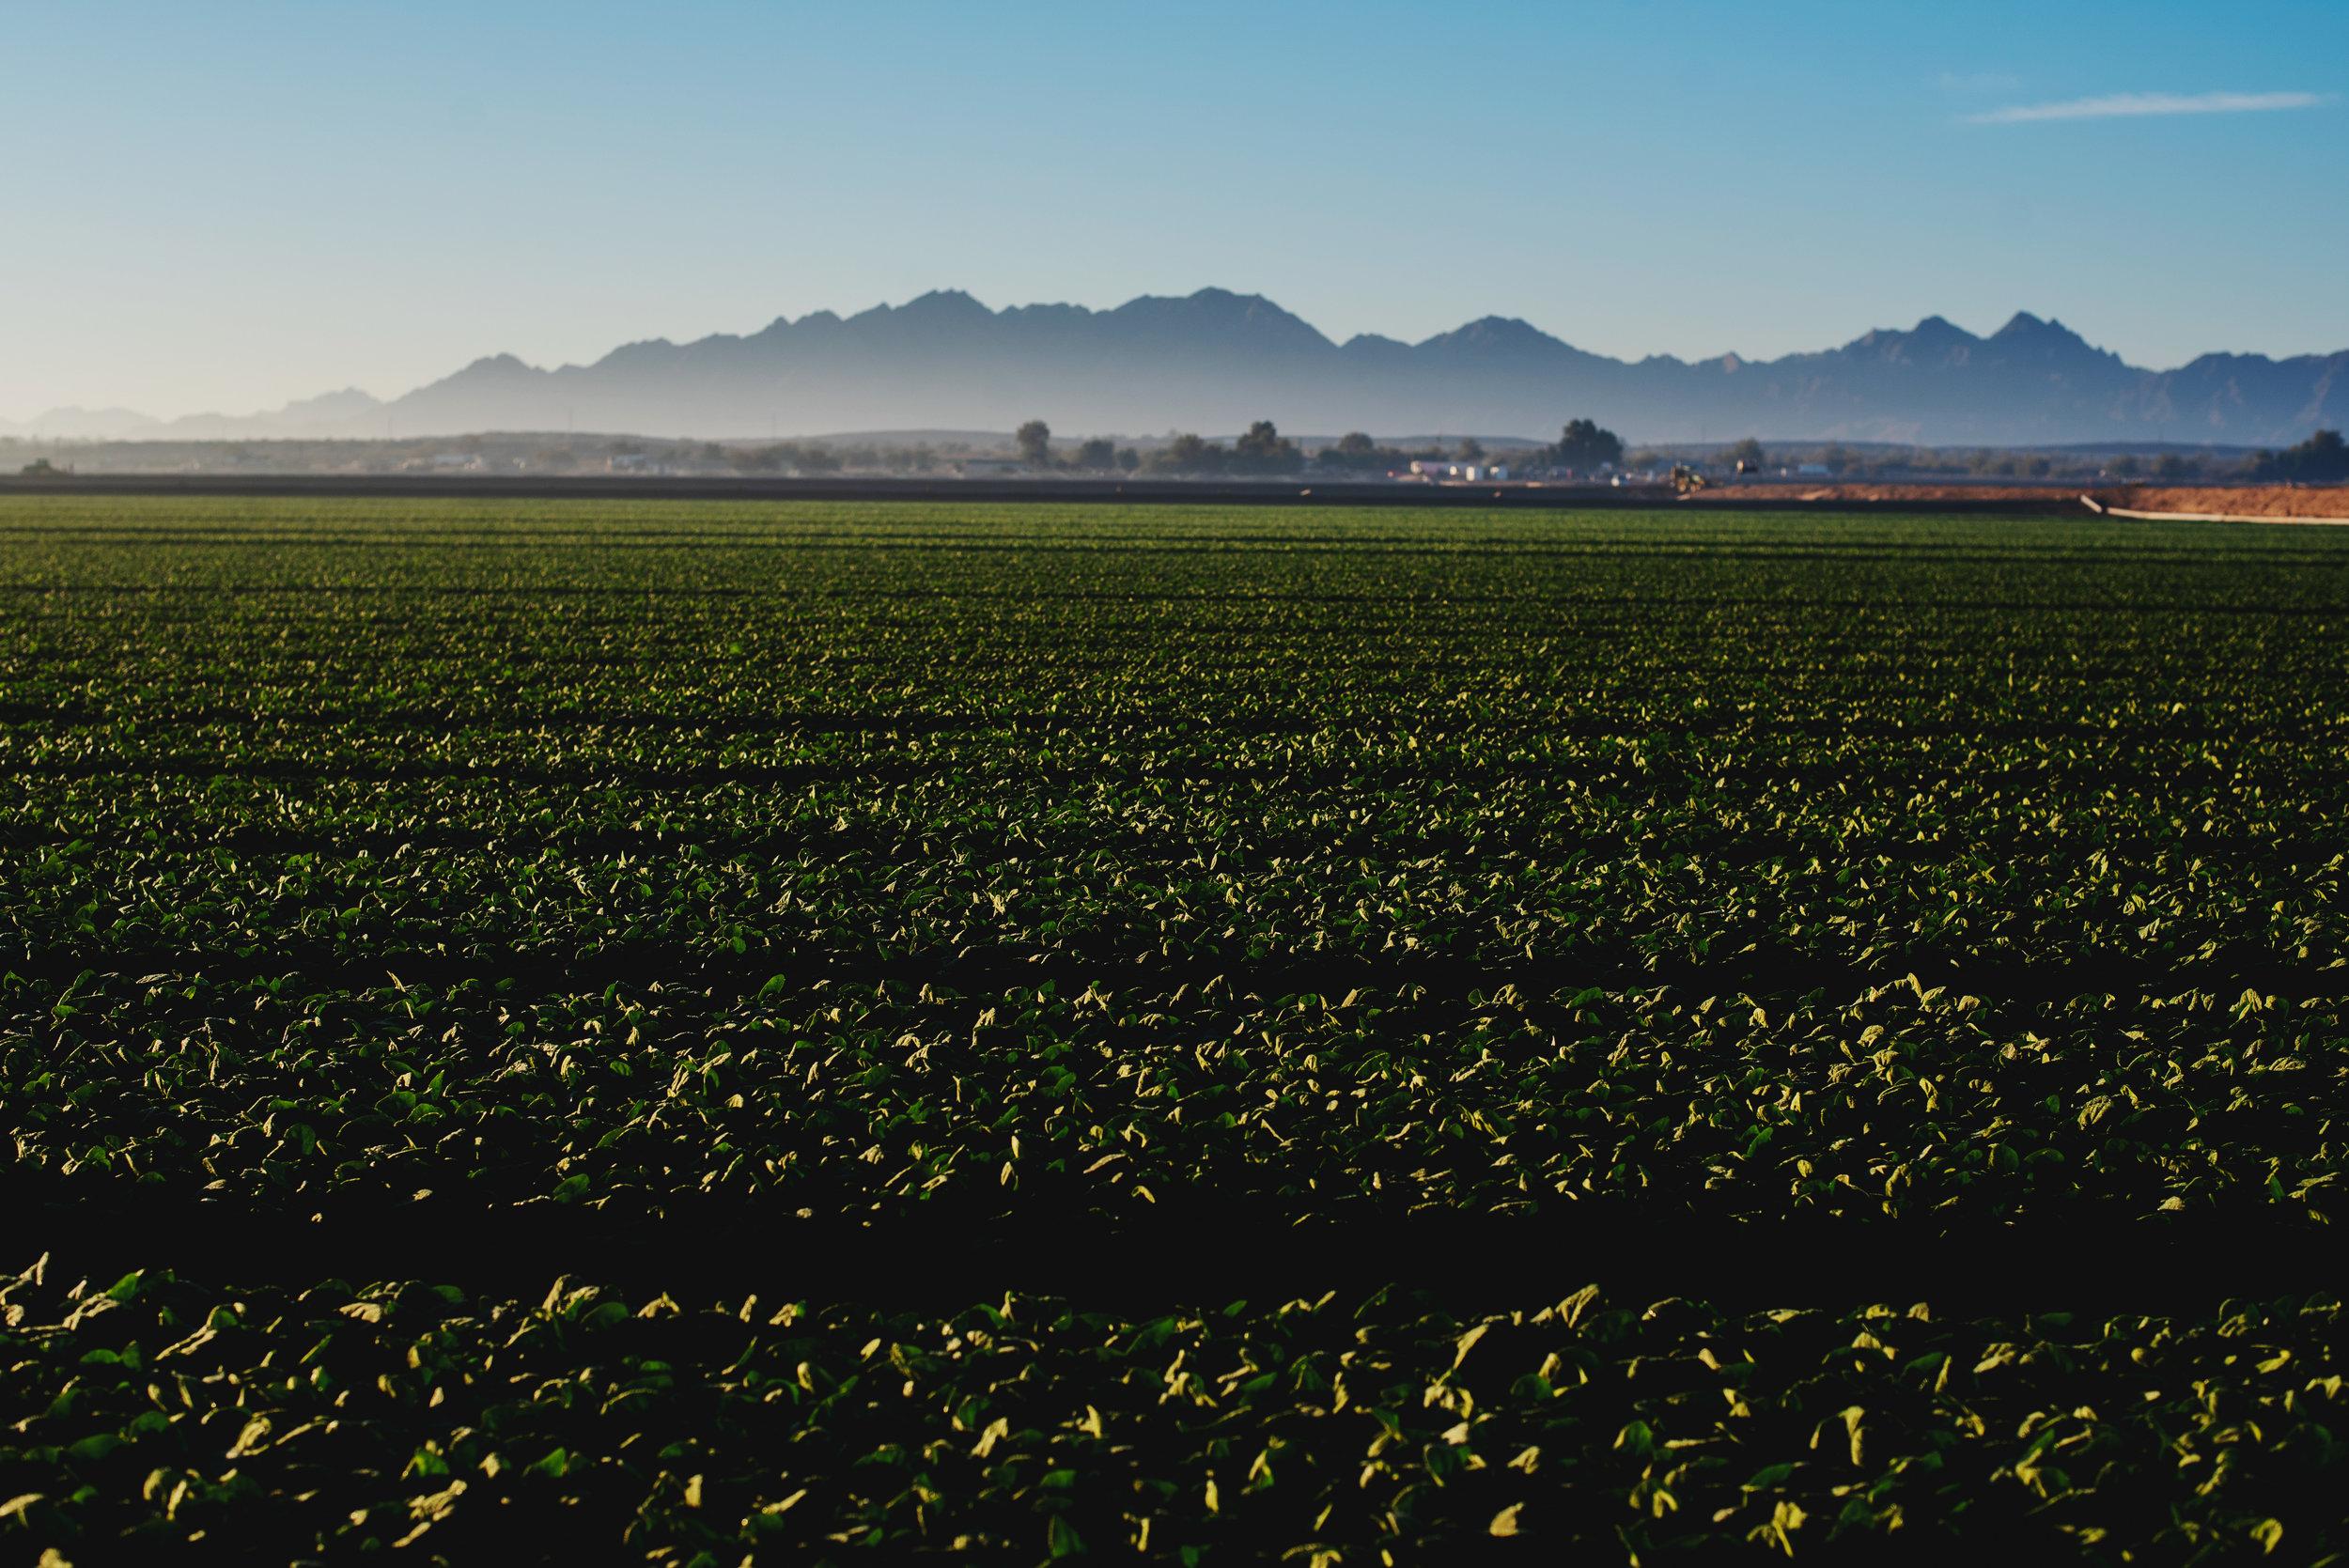 Arizona-Spinach_0098.jpg